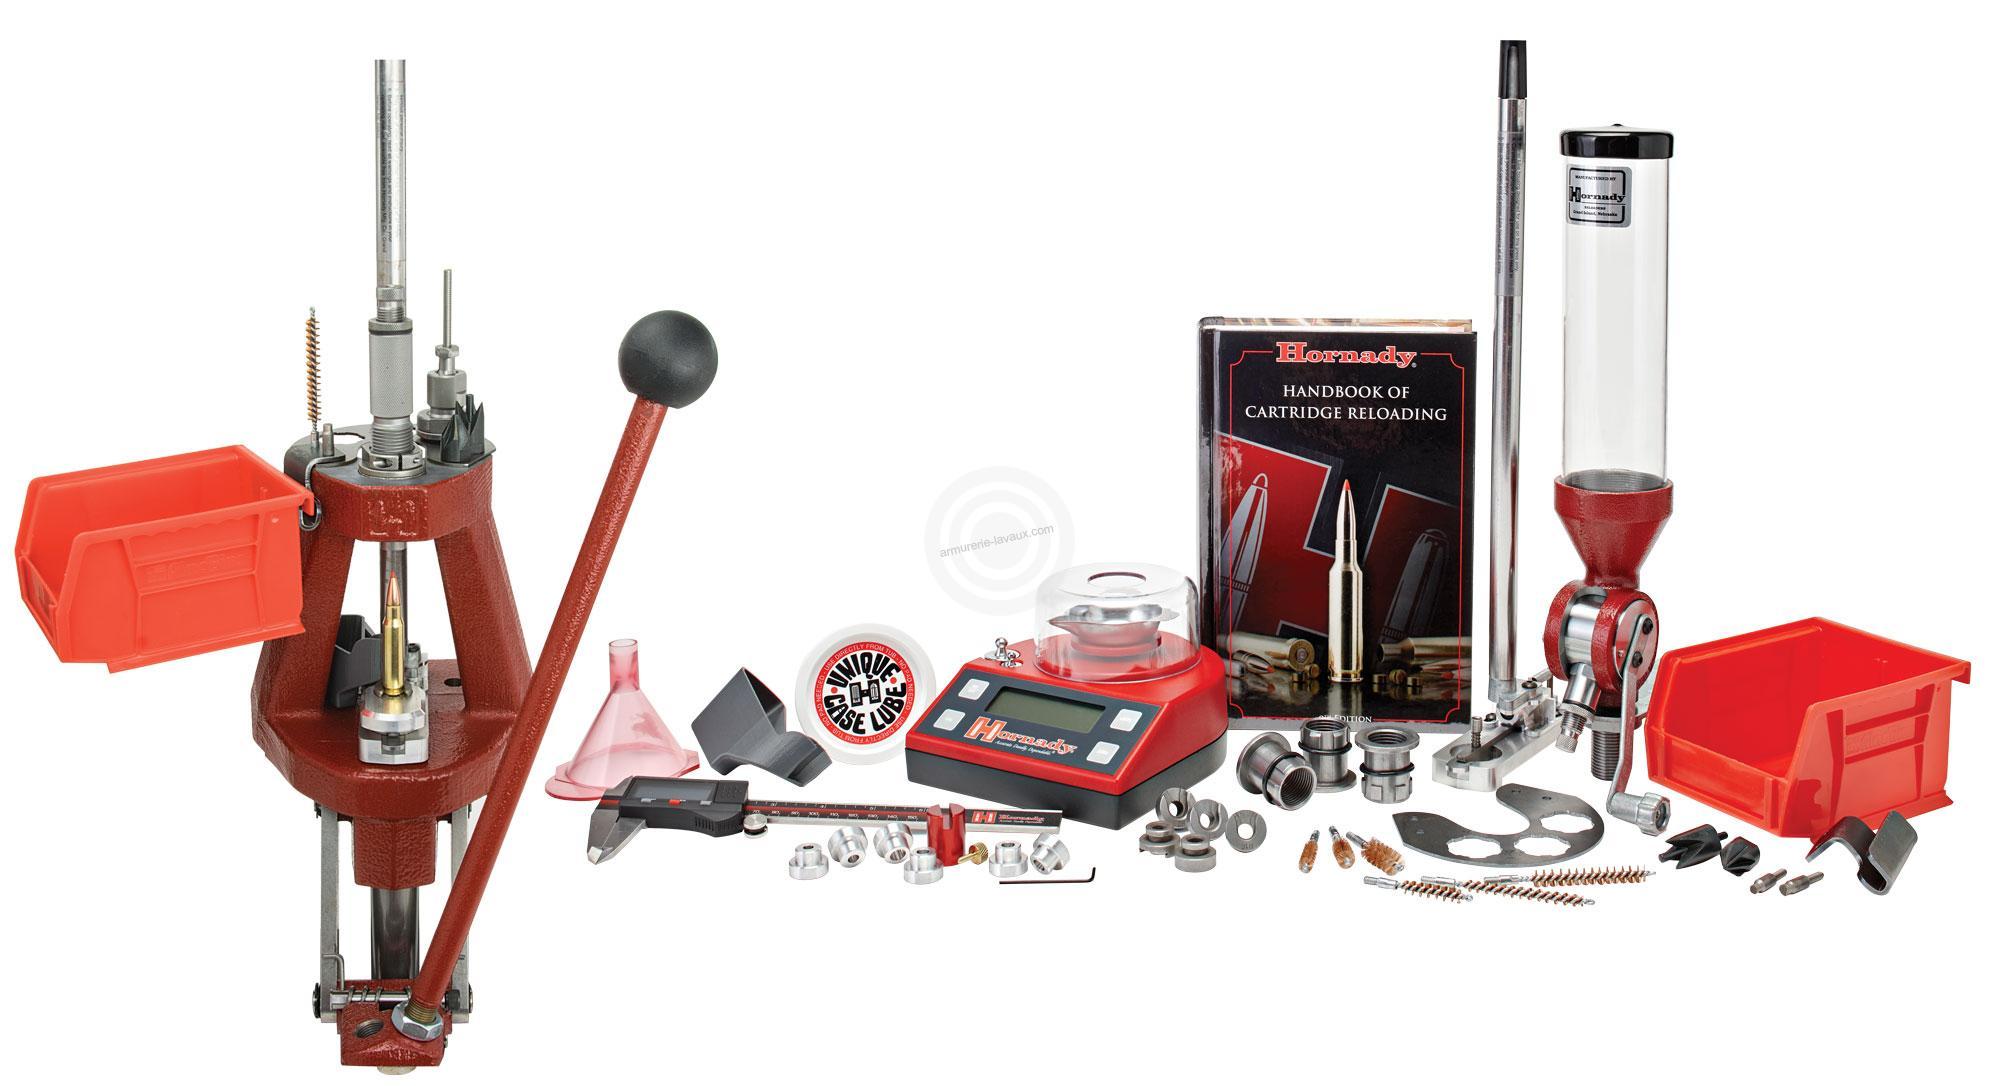 presse hornady lock n load iron kit amorceur manuel rechargement sur armurerie lavaux. Black Bedroom Furniture Sets. Home Design Ideas